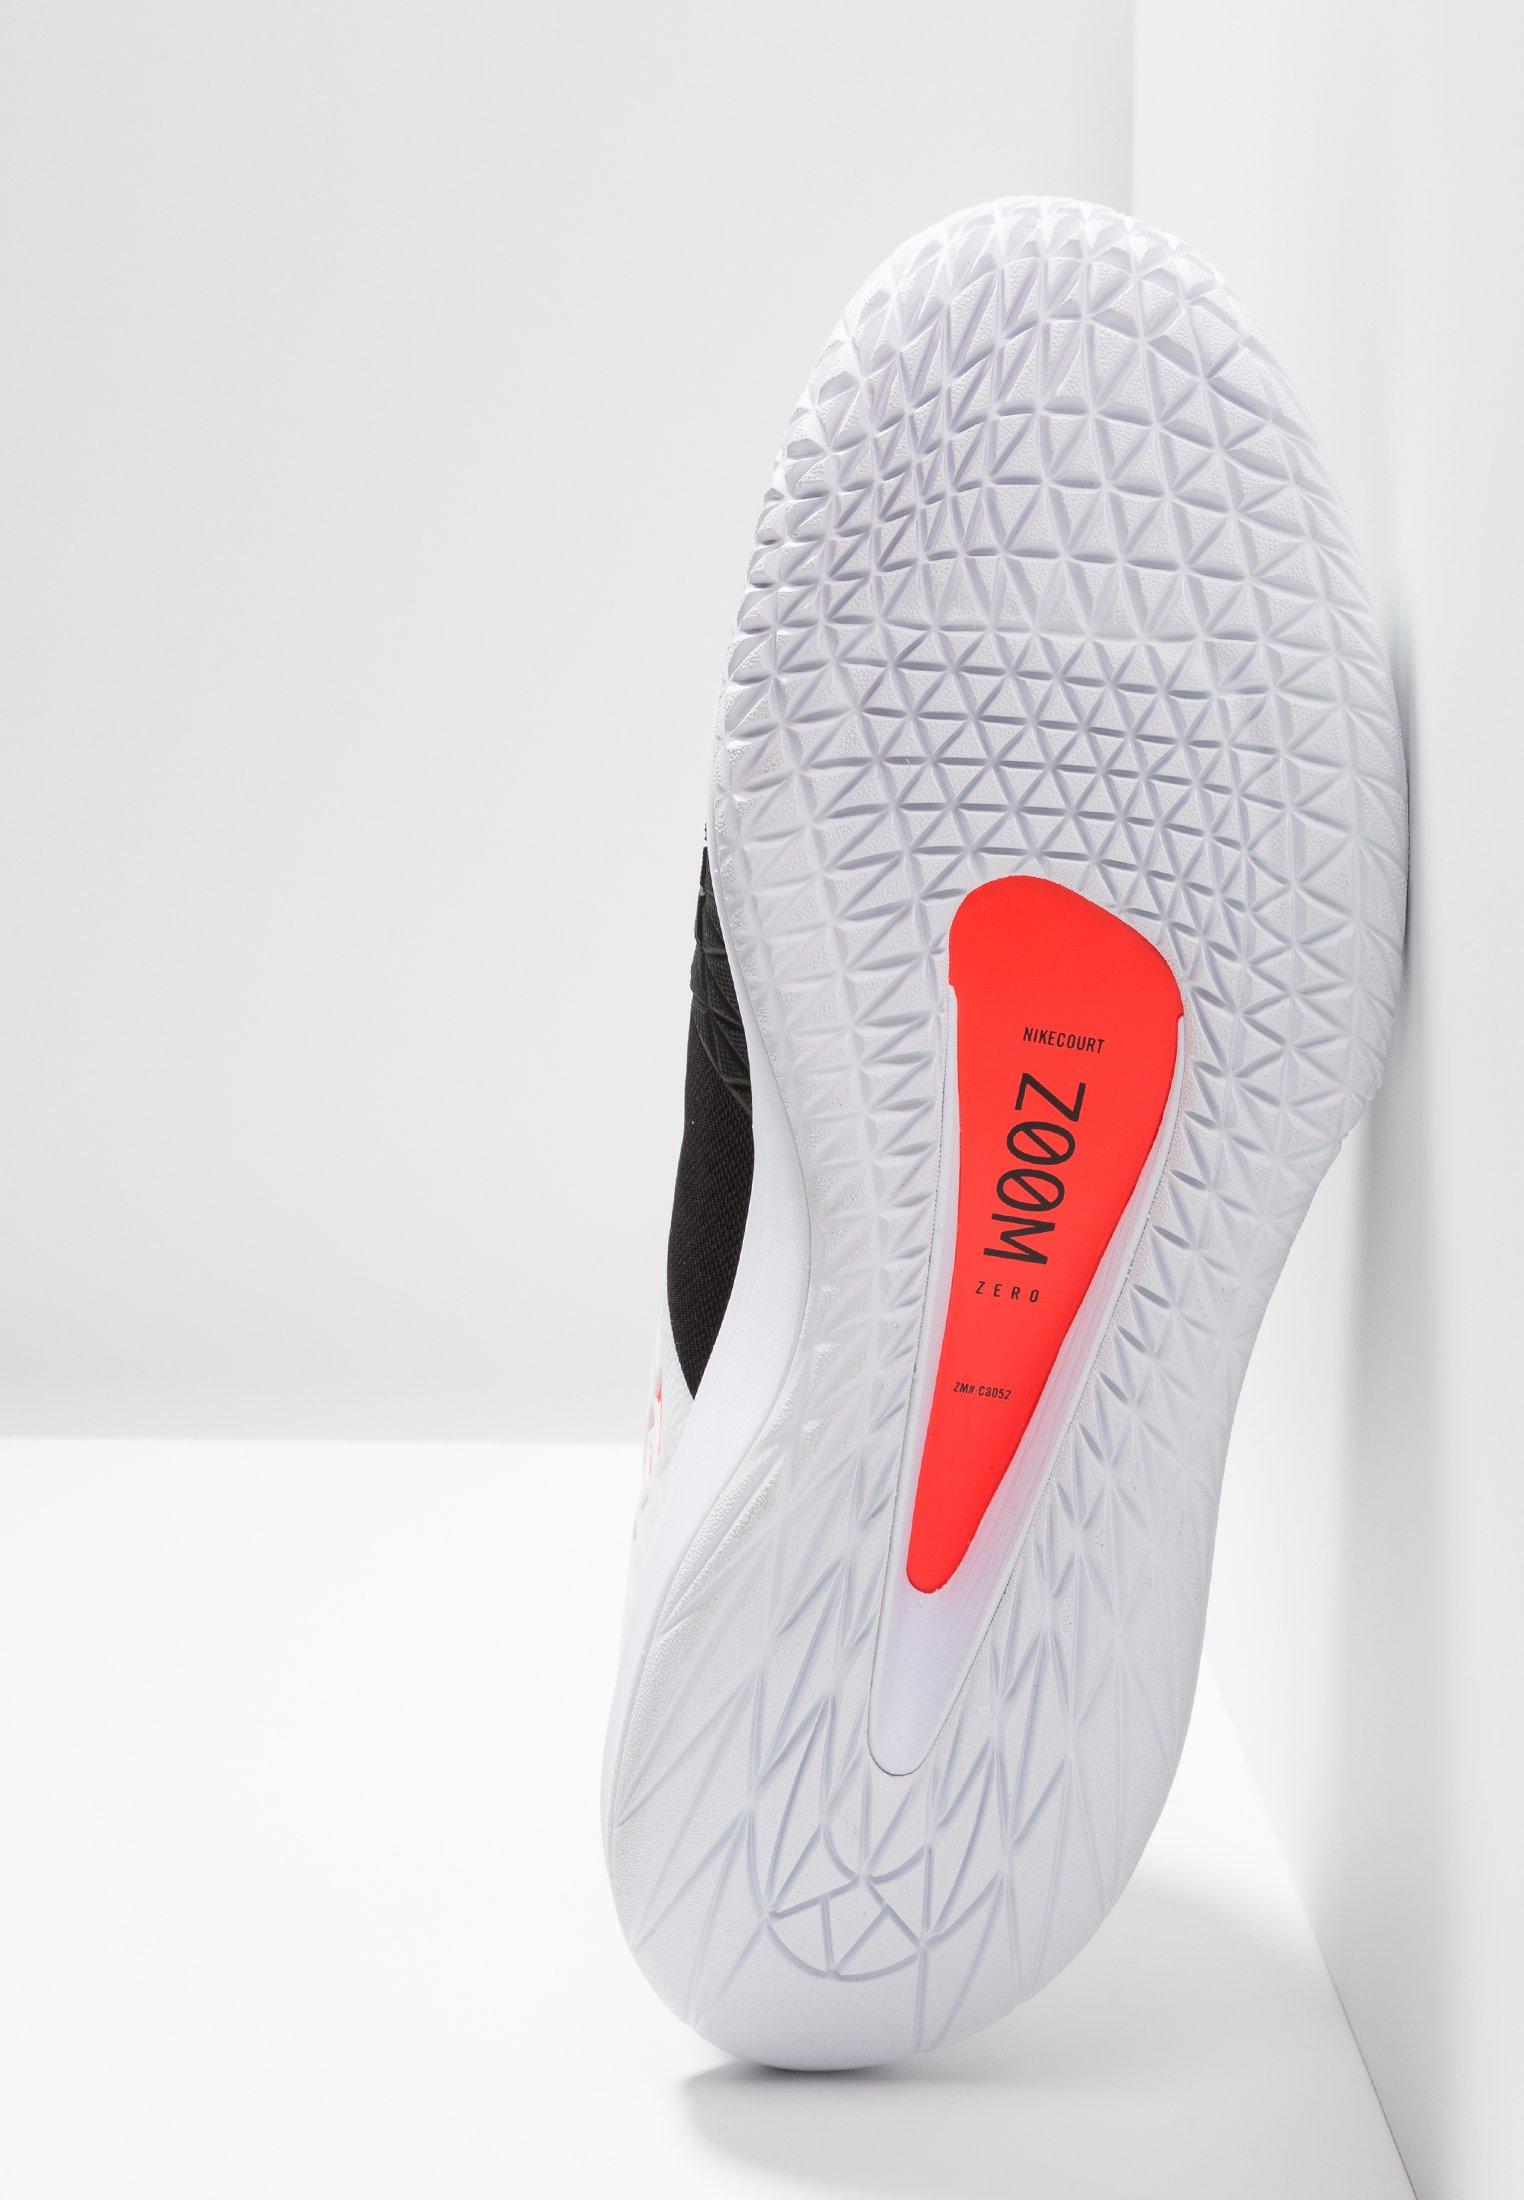 Nike Performance Air Zoom Hc - Multicourt Tennisschuh Black/white/bright Crimson Black Friday